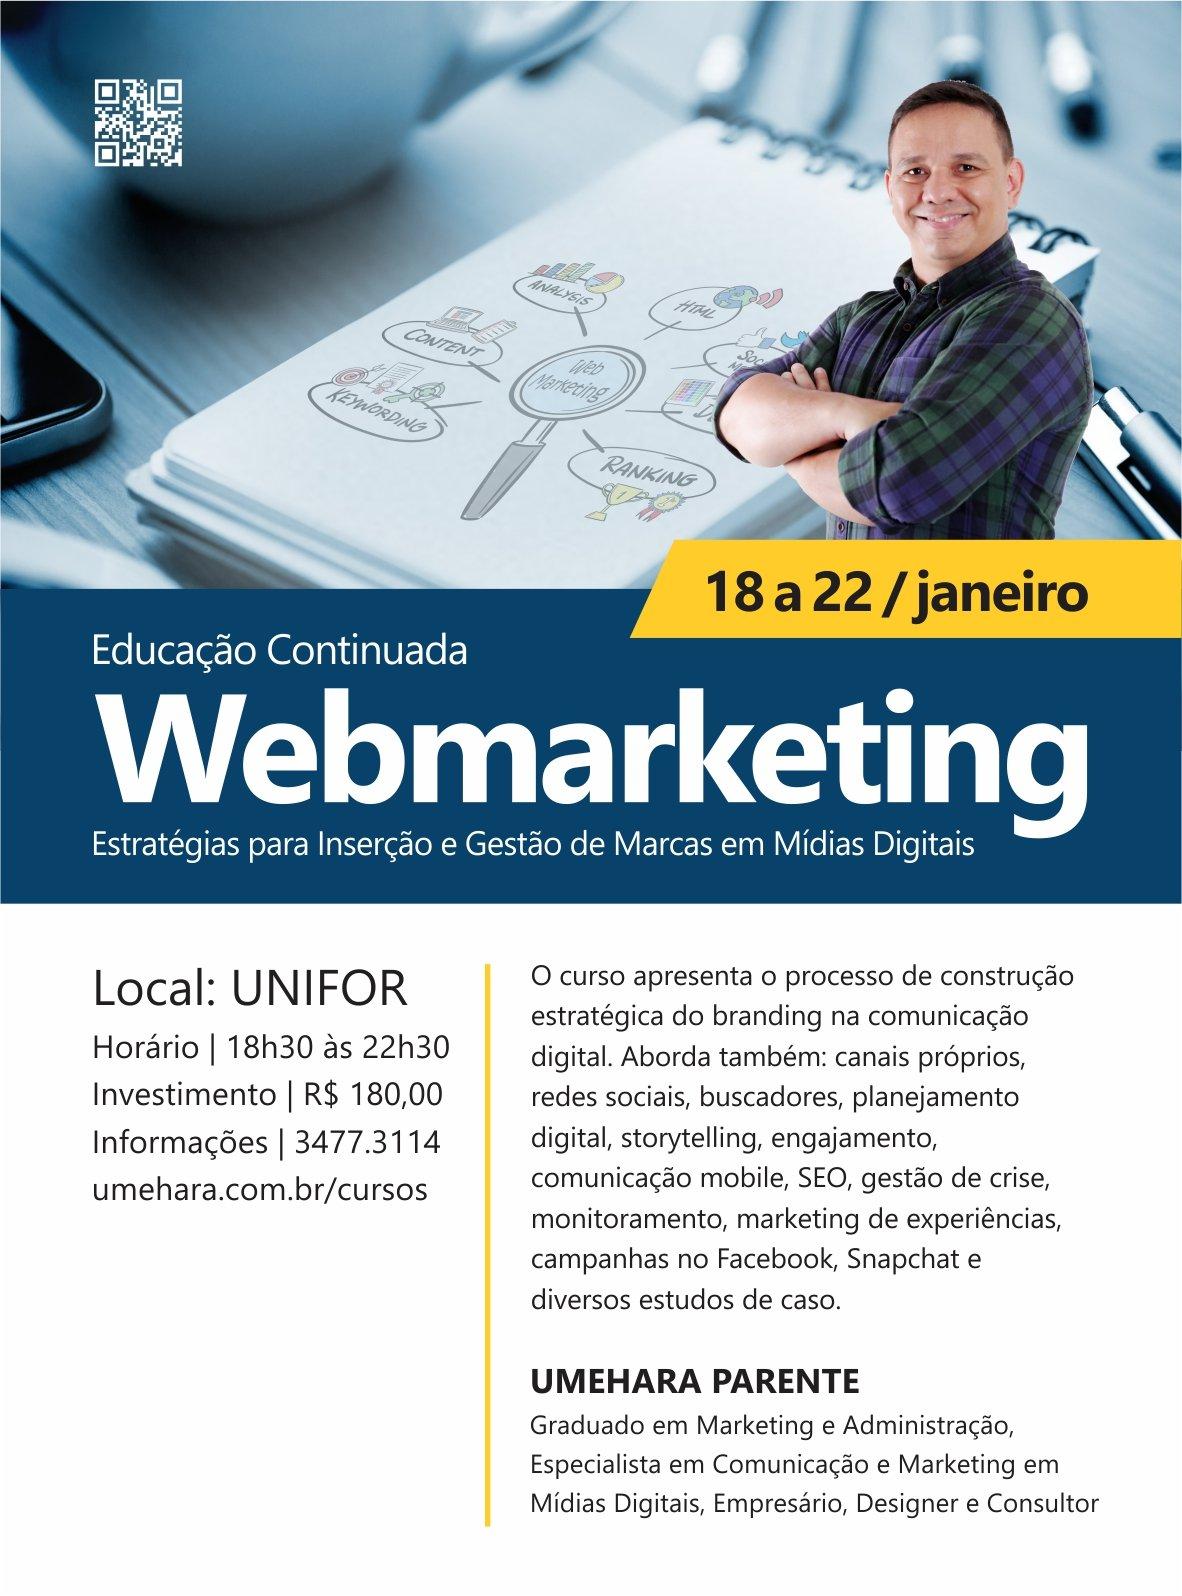 Curso Webmarketing - Email T3